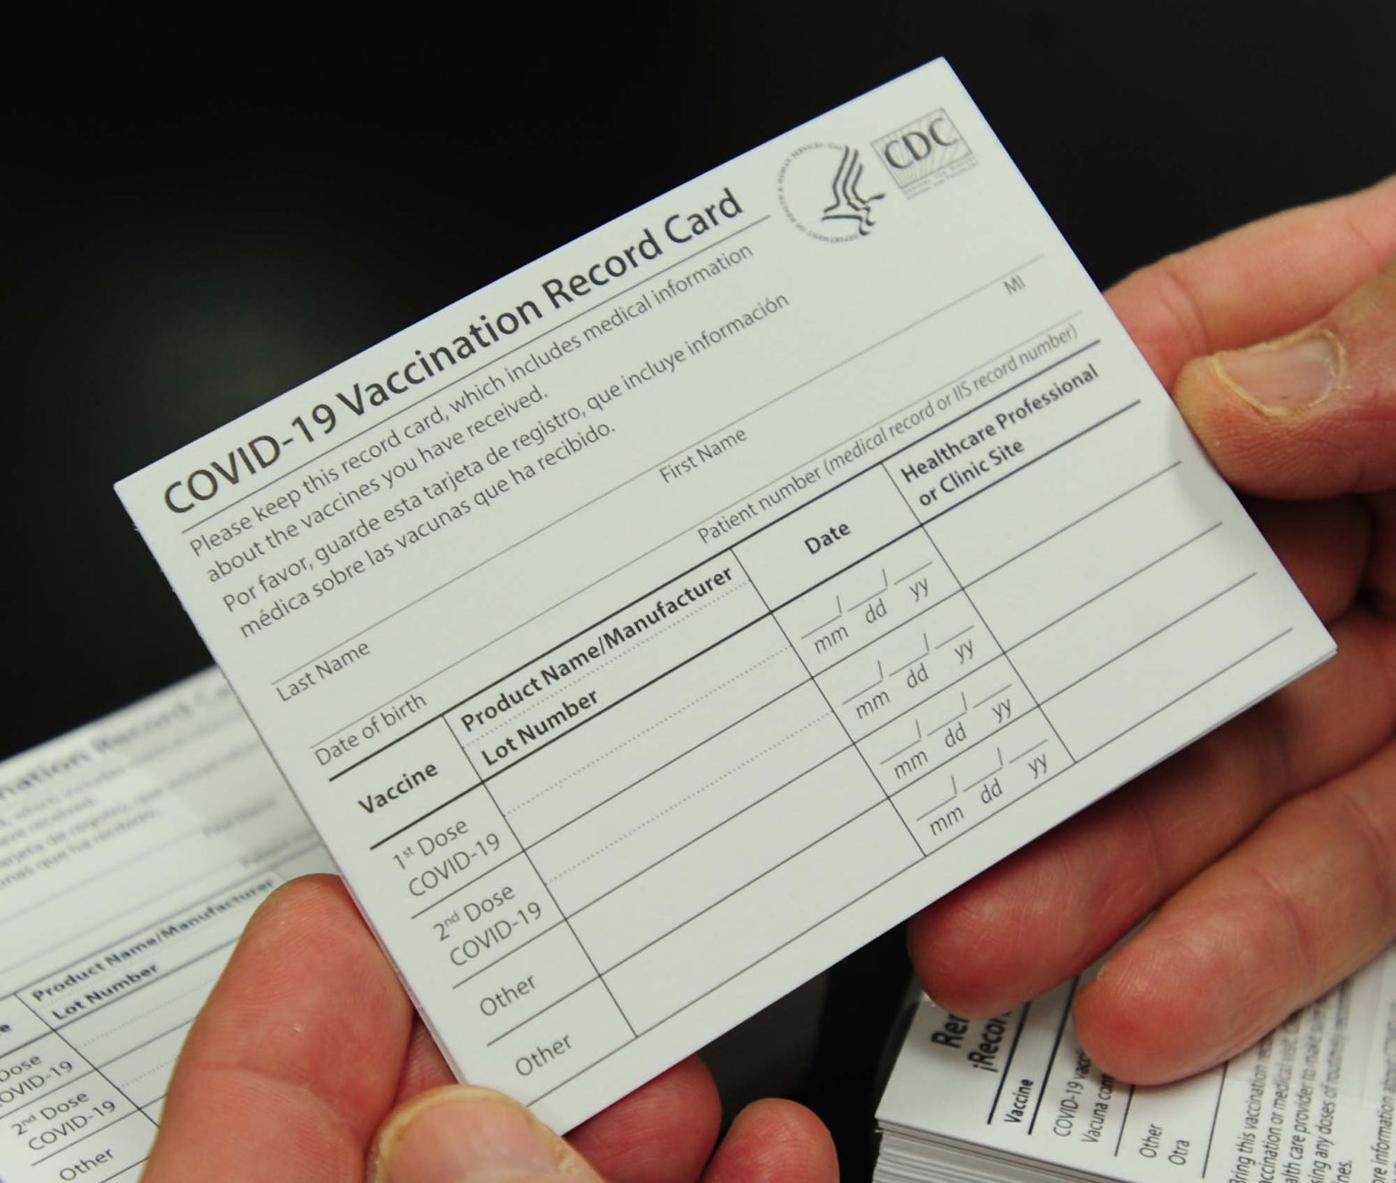 cv041221vaccinationcardp1